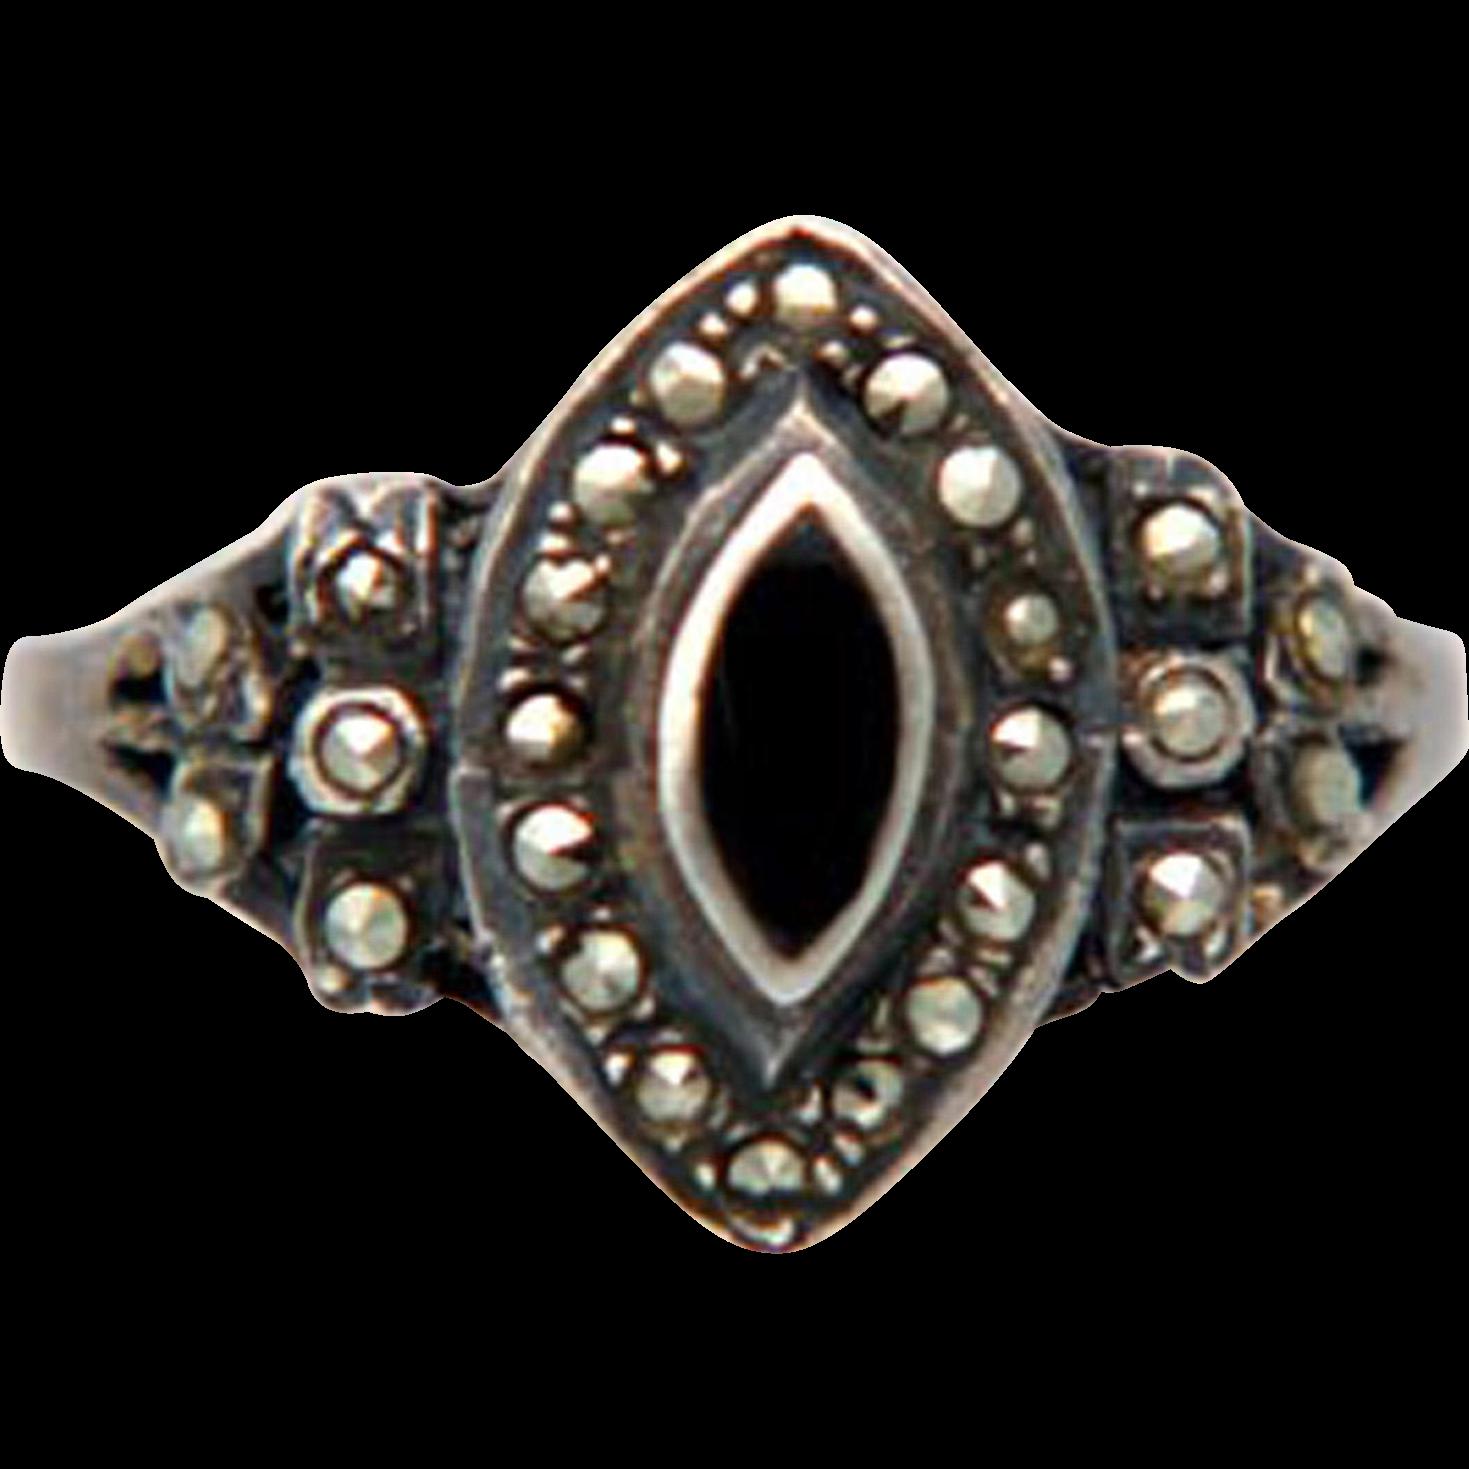 Vintage Art Deco Marcasite Black Tourmaline Sterling Ring Size 9